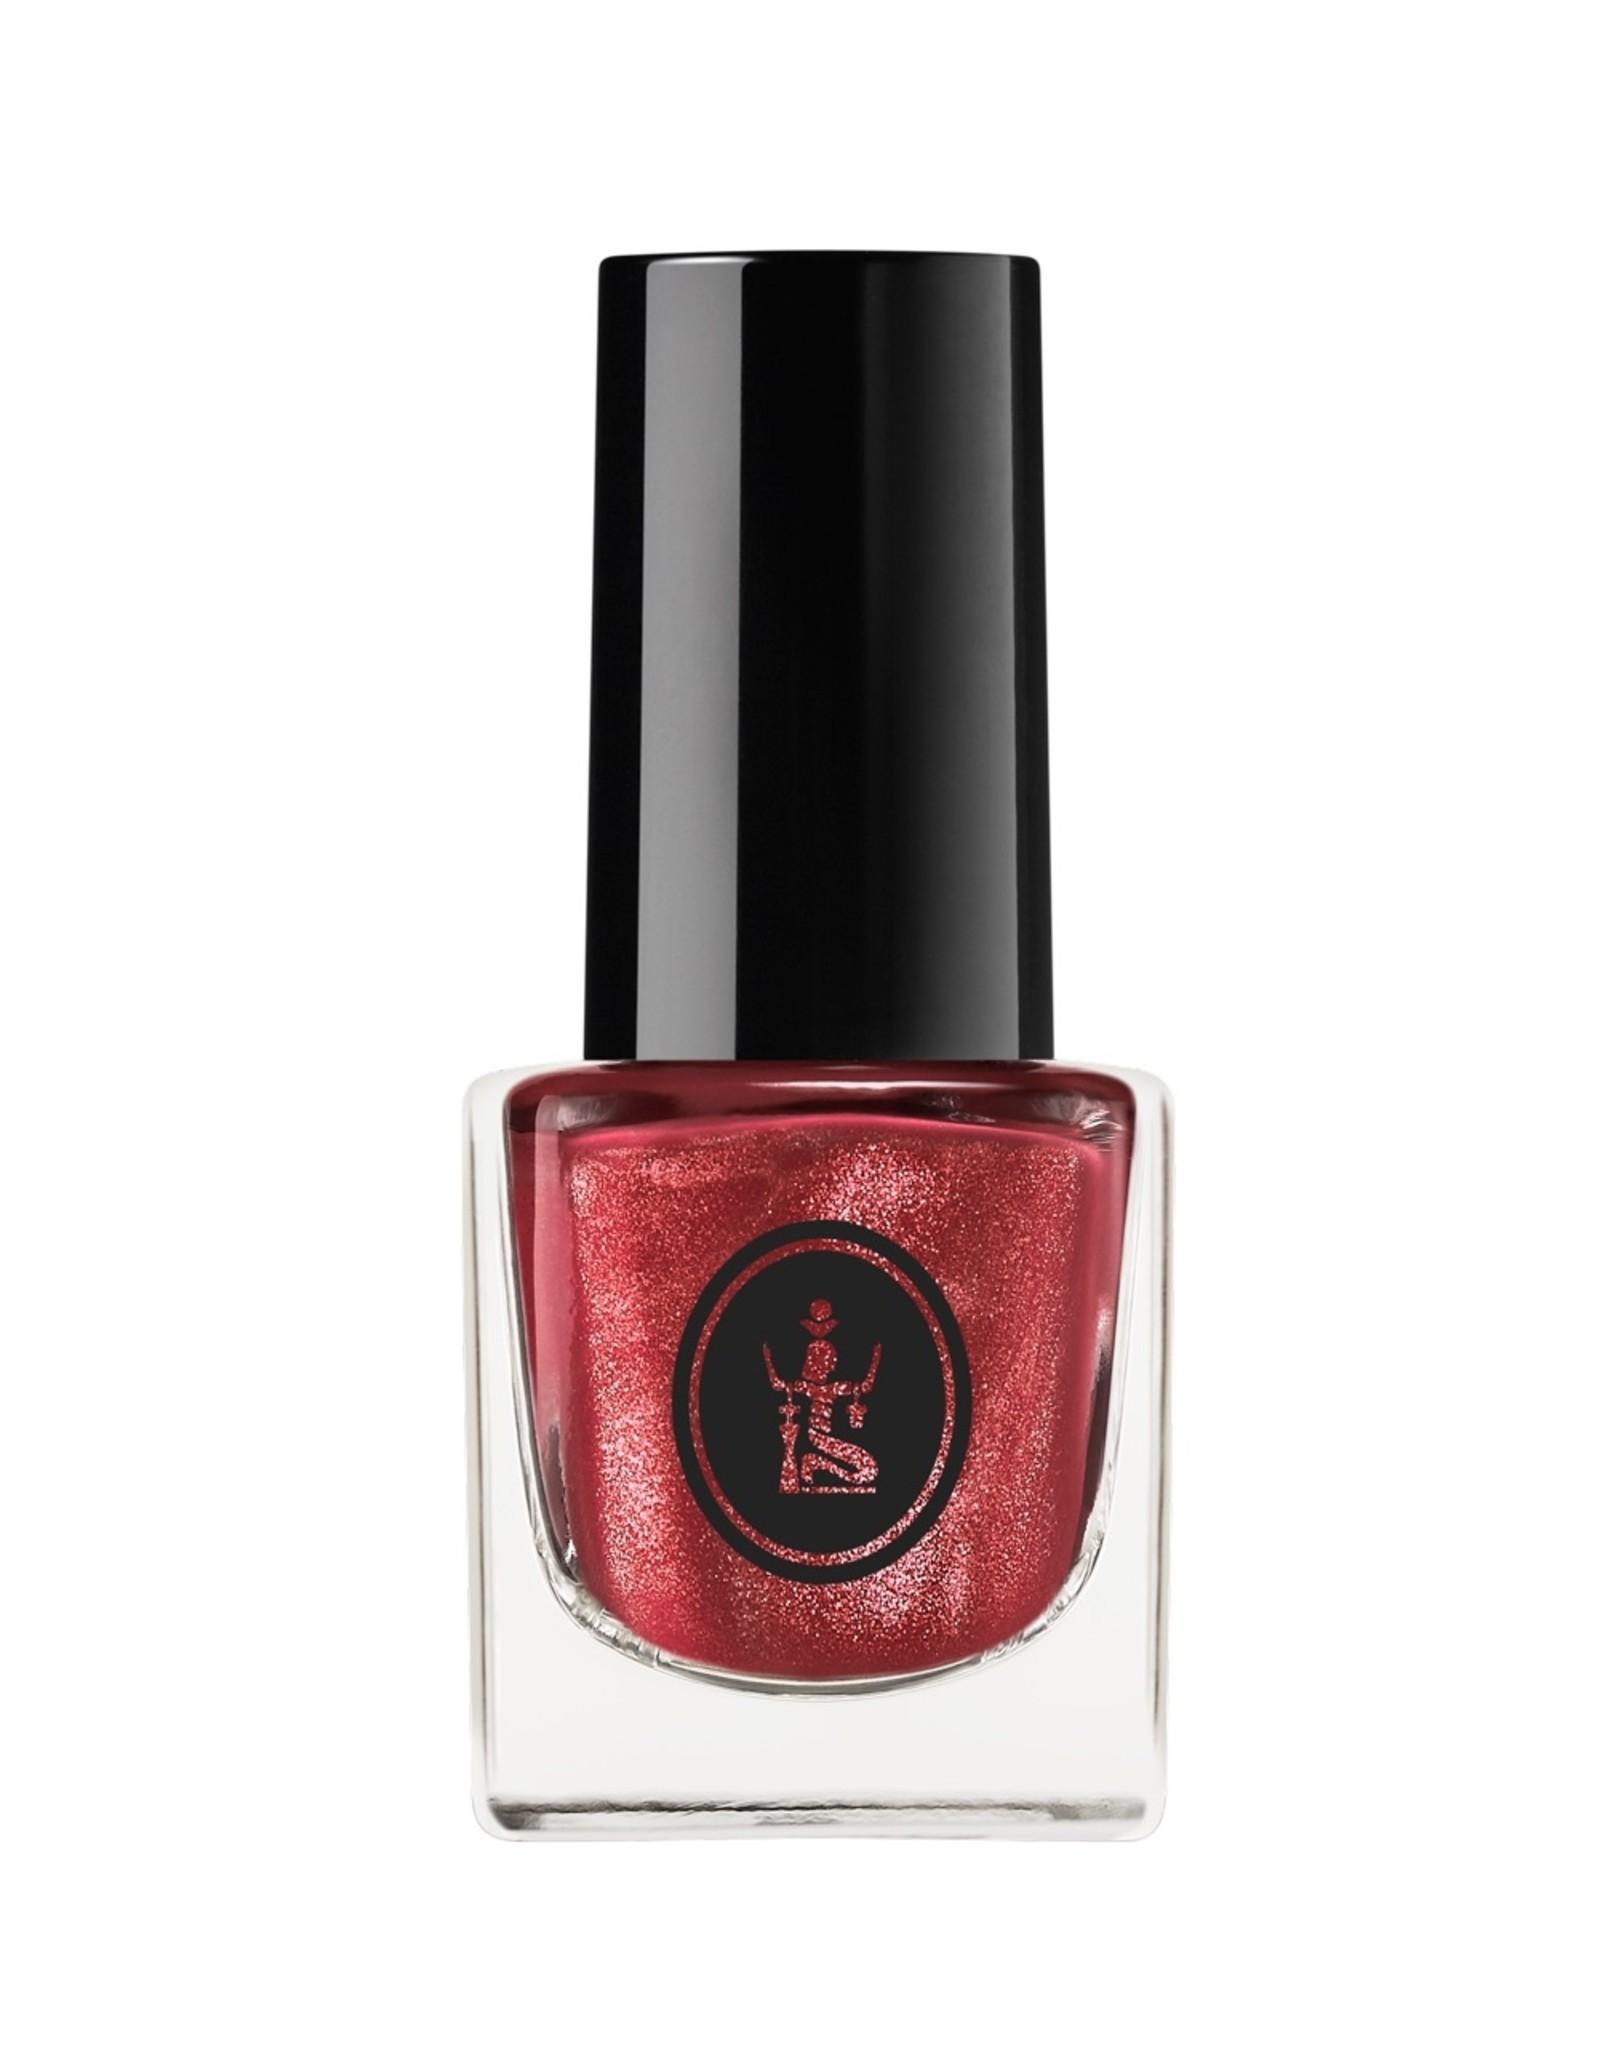 SOTHYS Nail polish - Rouge vibrant